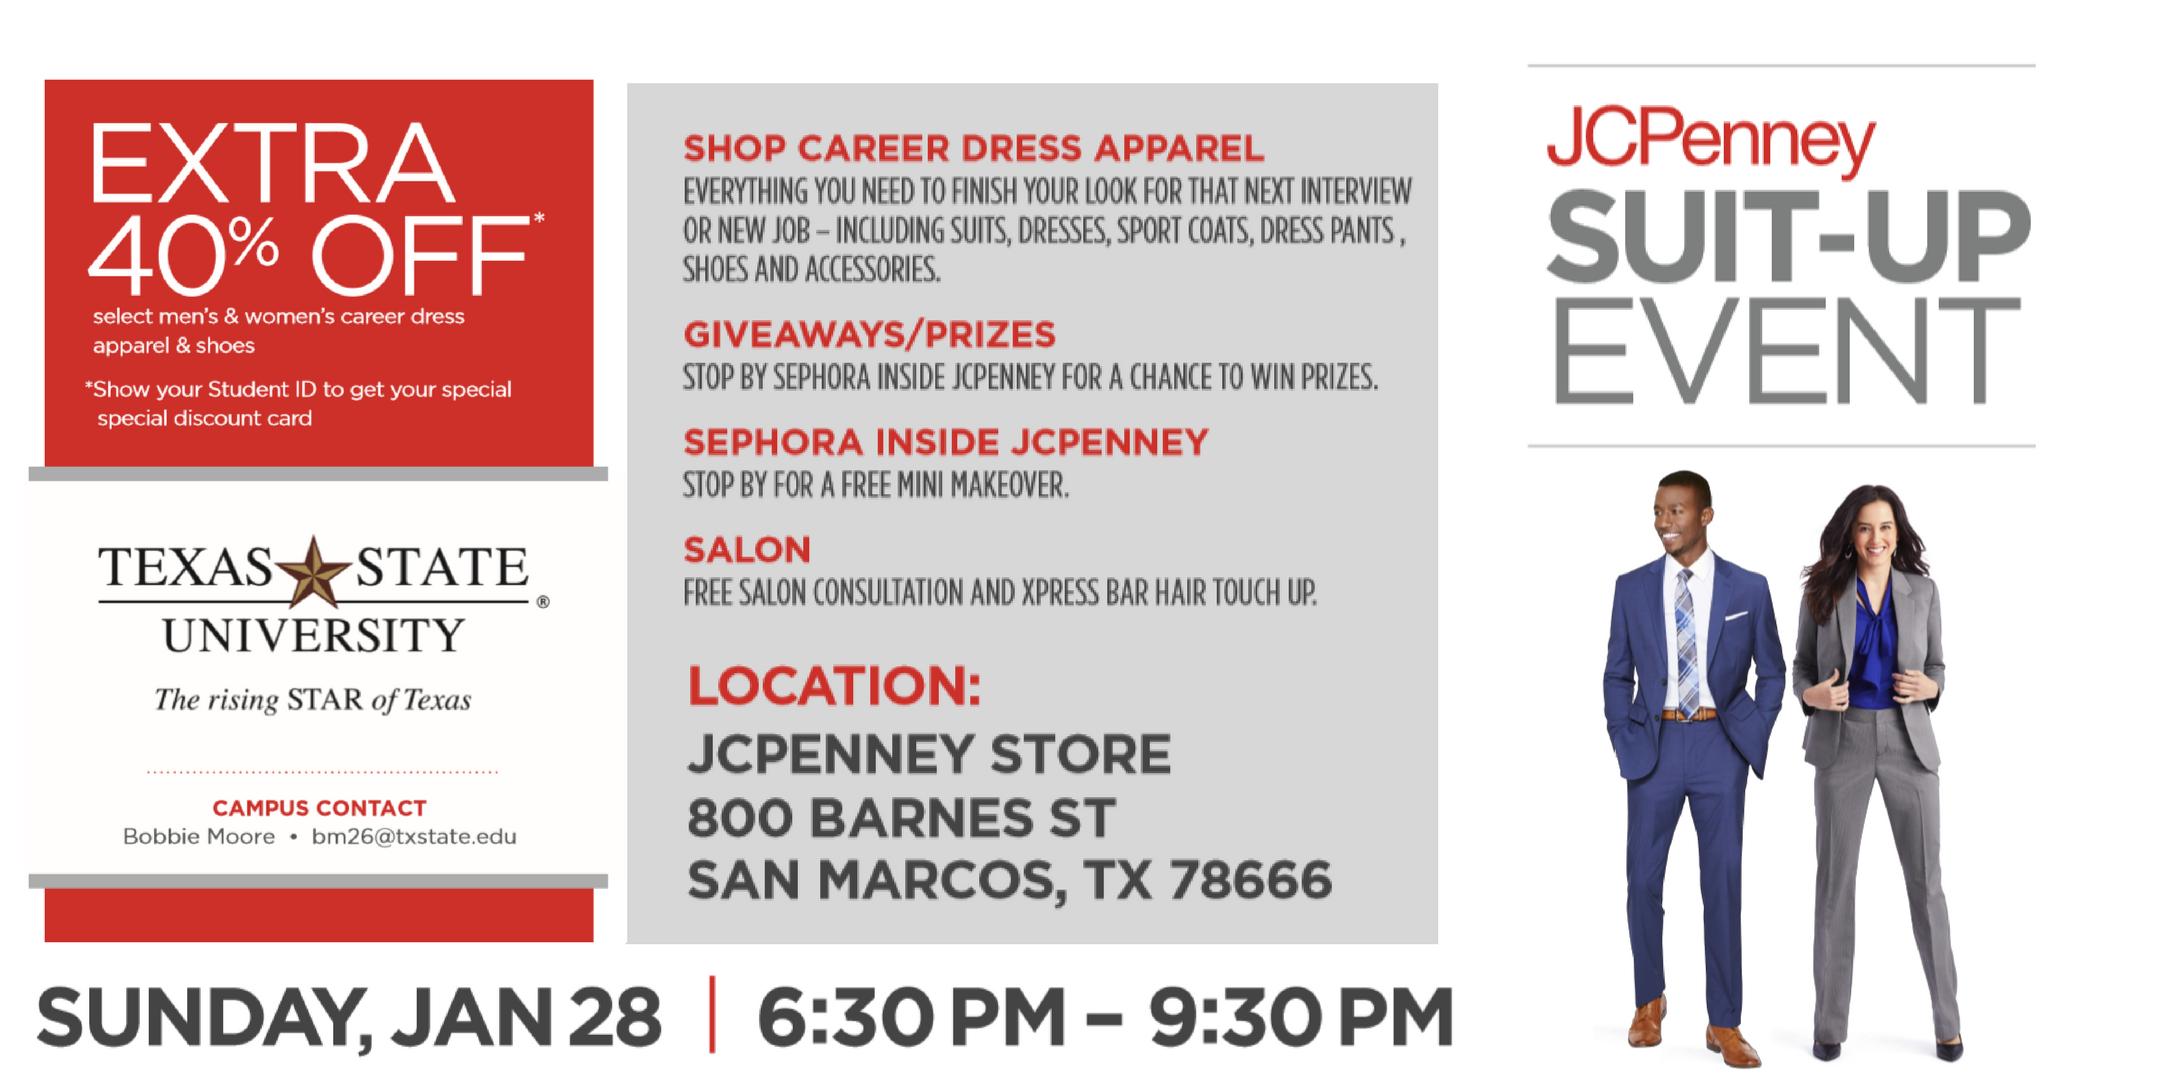 Jcpenney Suit Up Event 28 Jan 2018